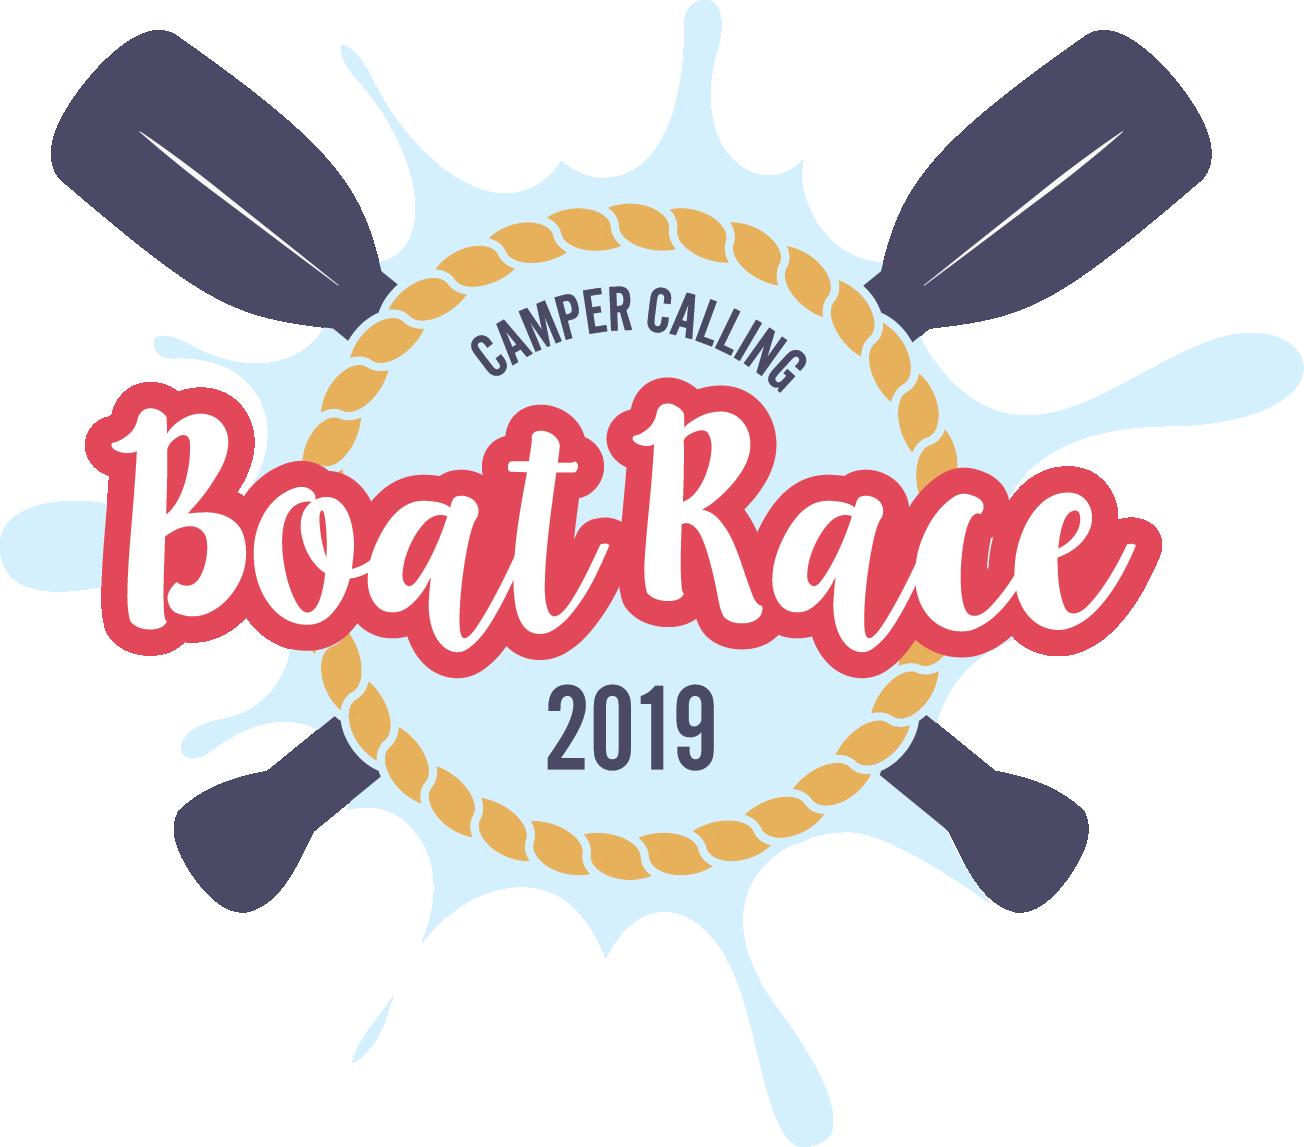 CC Boat Race Logo_GOLD 2019.png